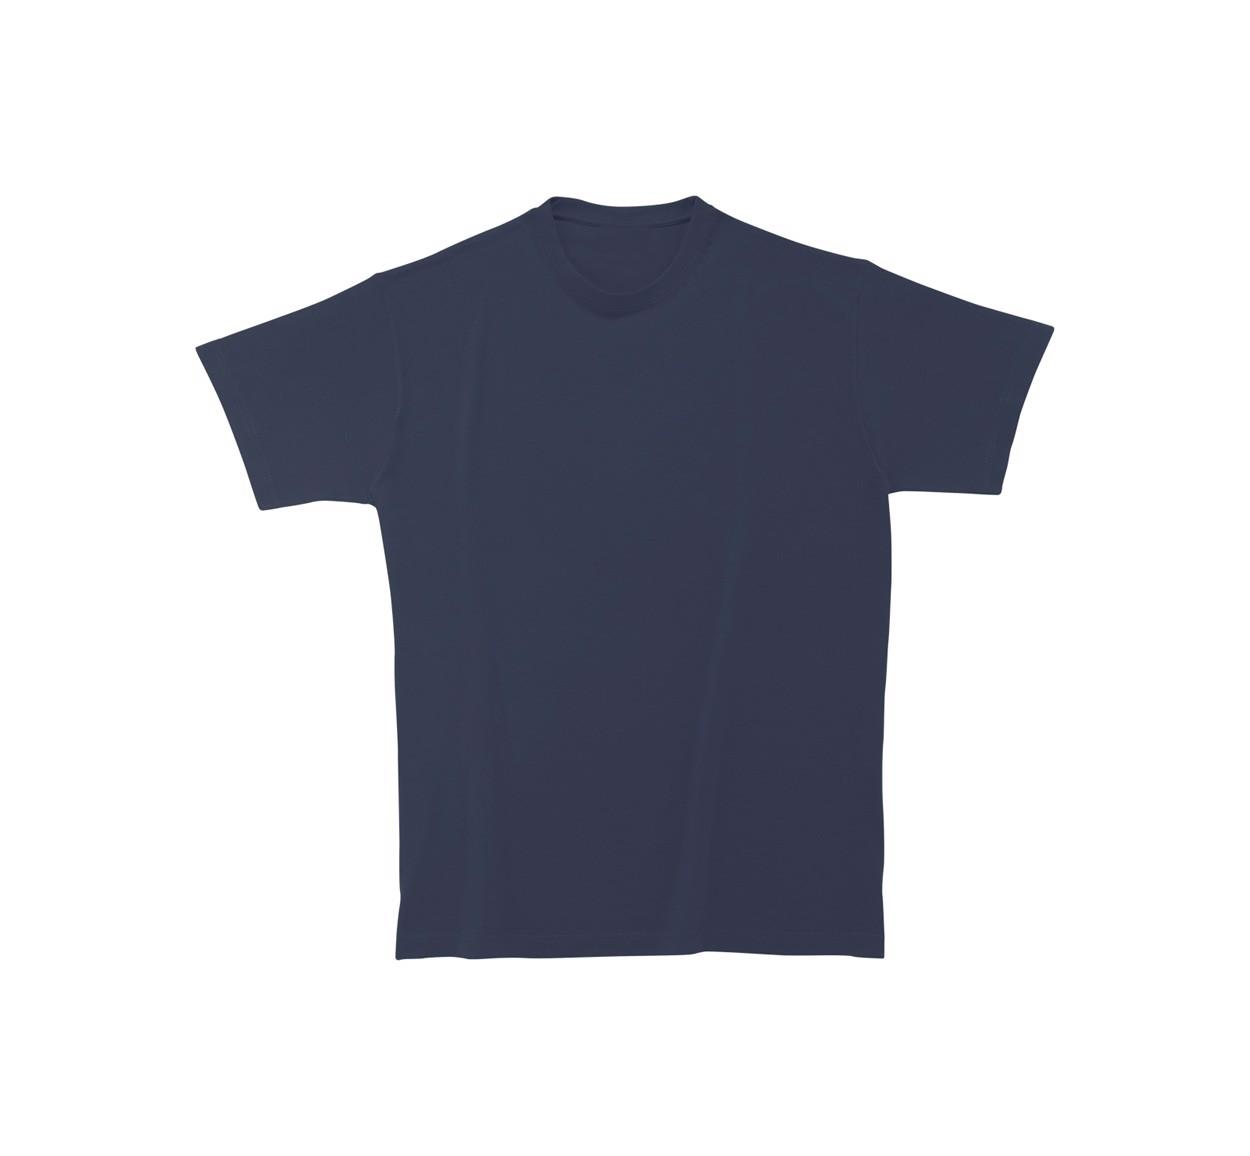 Tricou Bărbați Softstyle Man - Albastru Închis / XXL